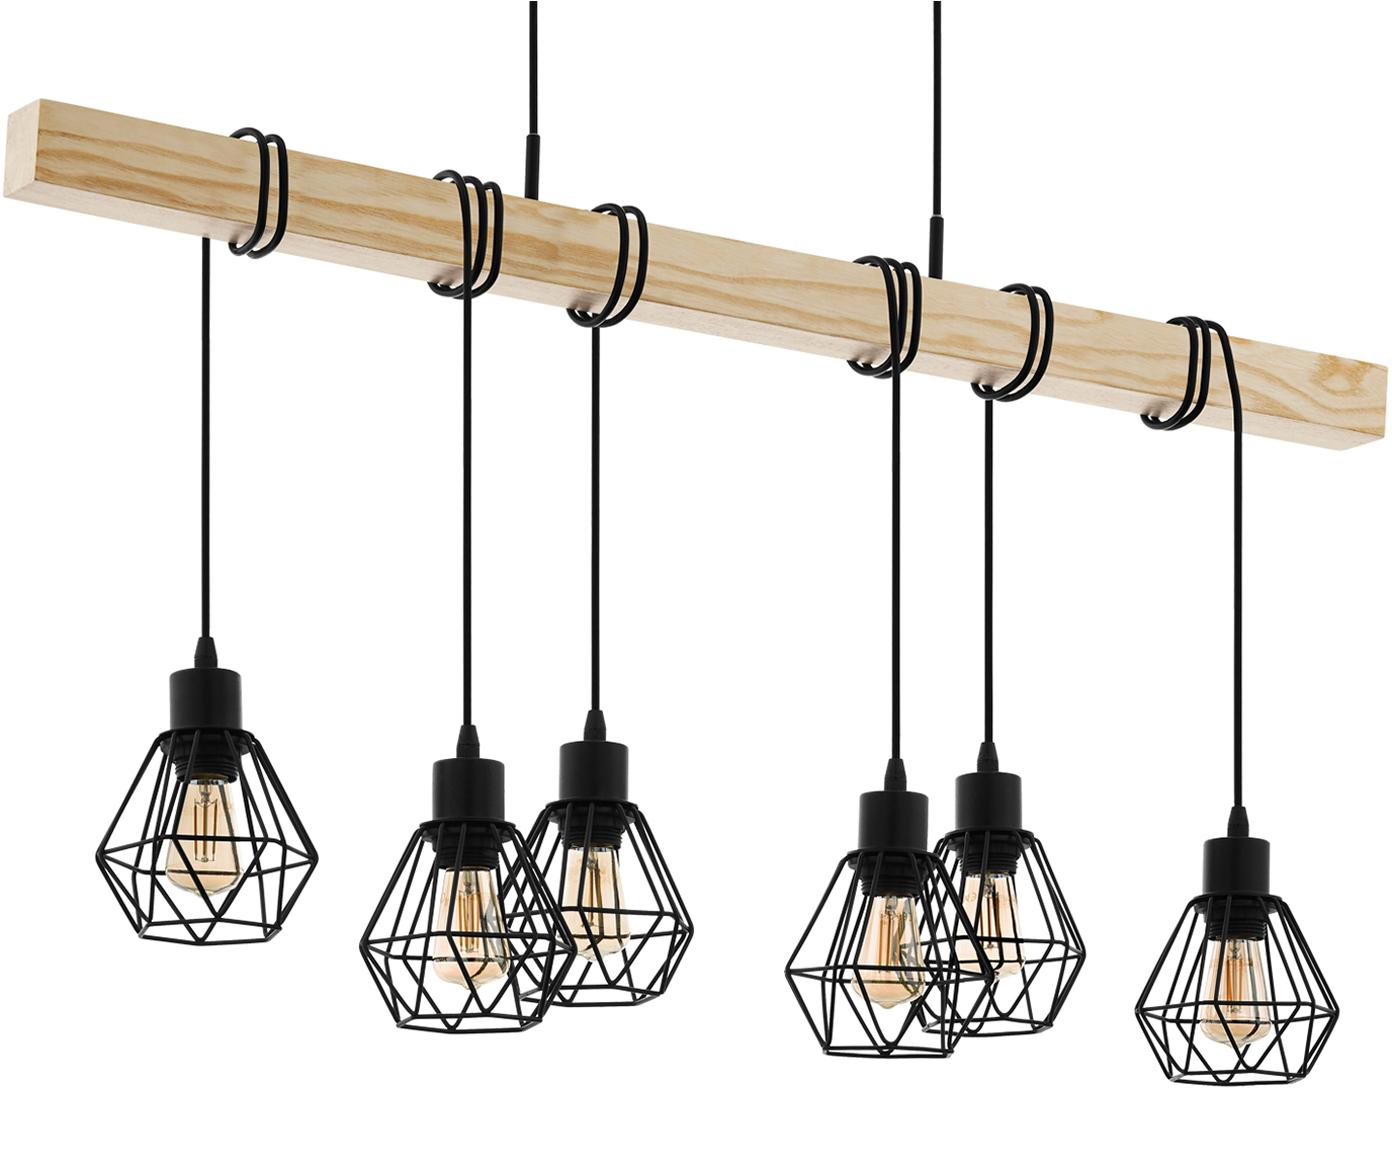 Lámpara de techo grande Townshend, Barra: madera, Cable: plástico, Negro, madera, An 100 x Al 110 cm